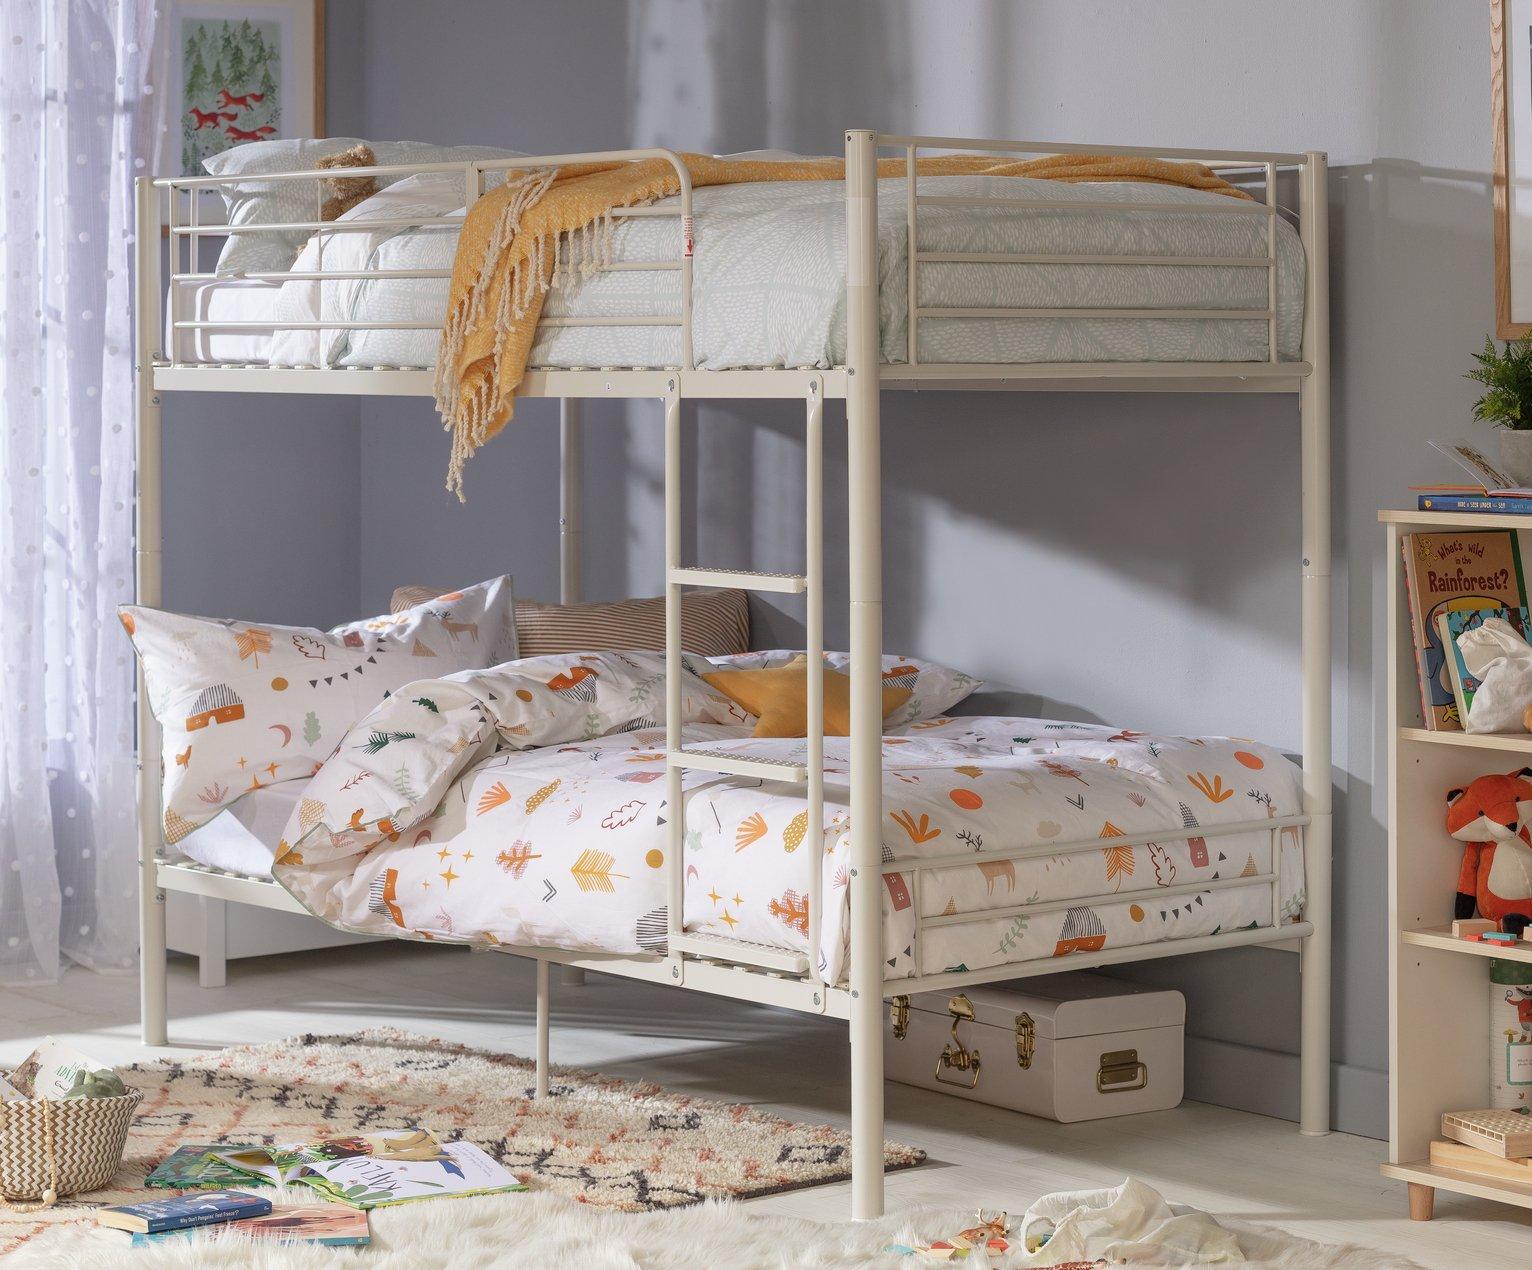 Argos Home Mason Take Home Today Metal Bunk Bed - White